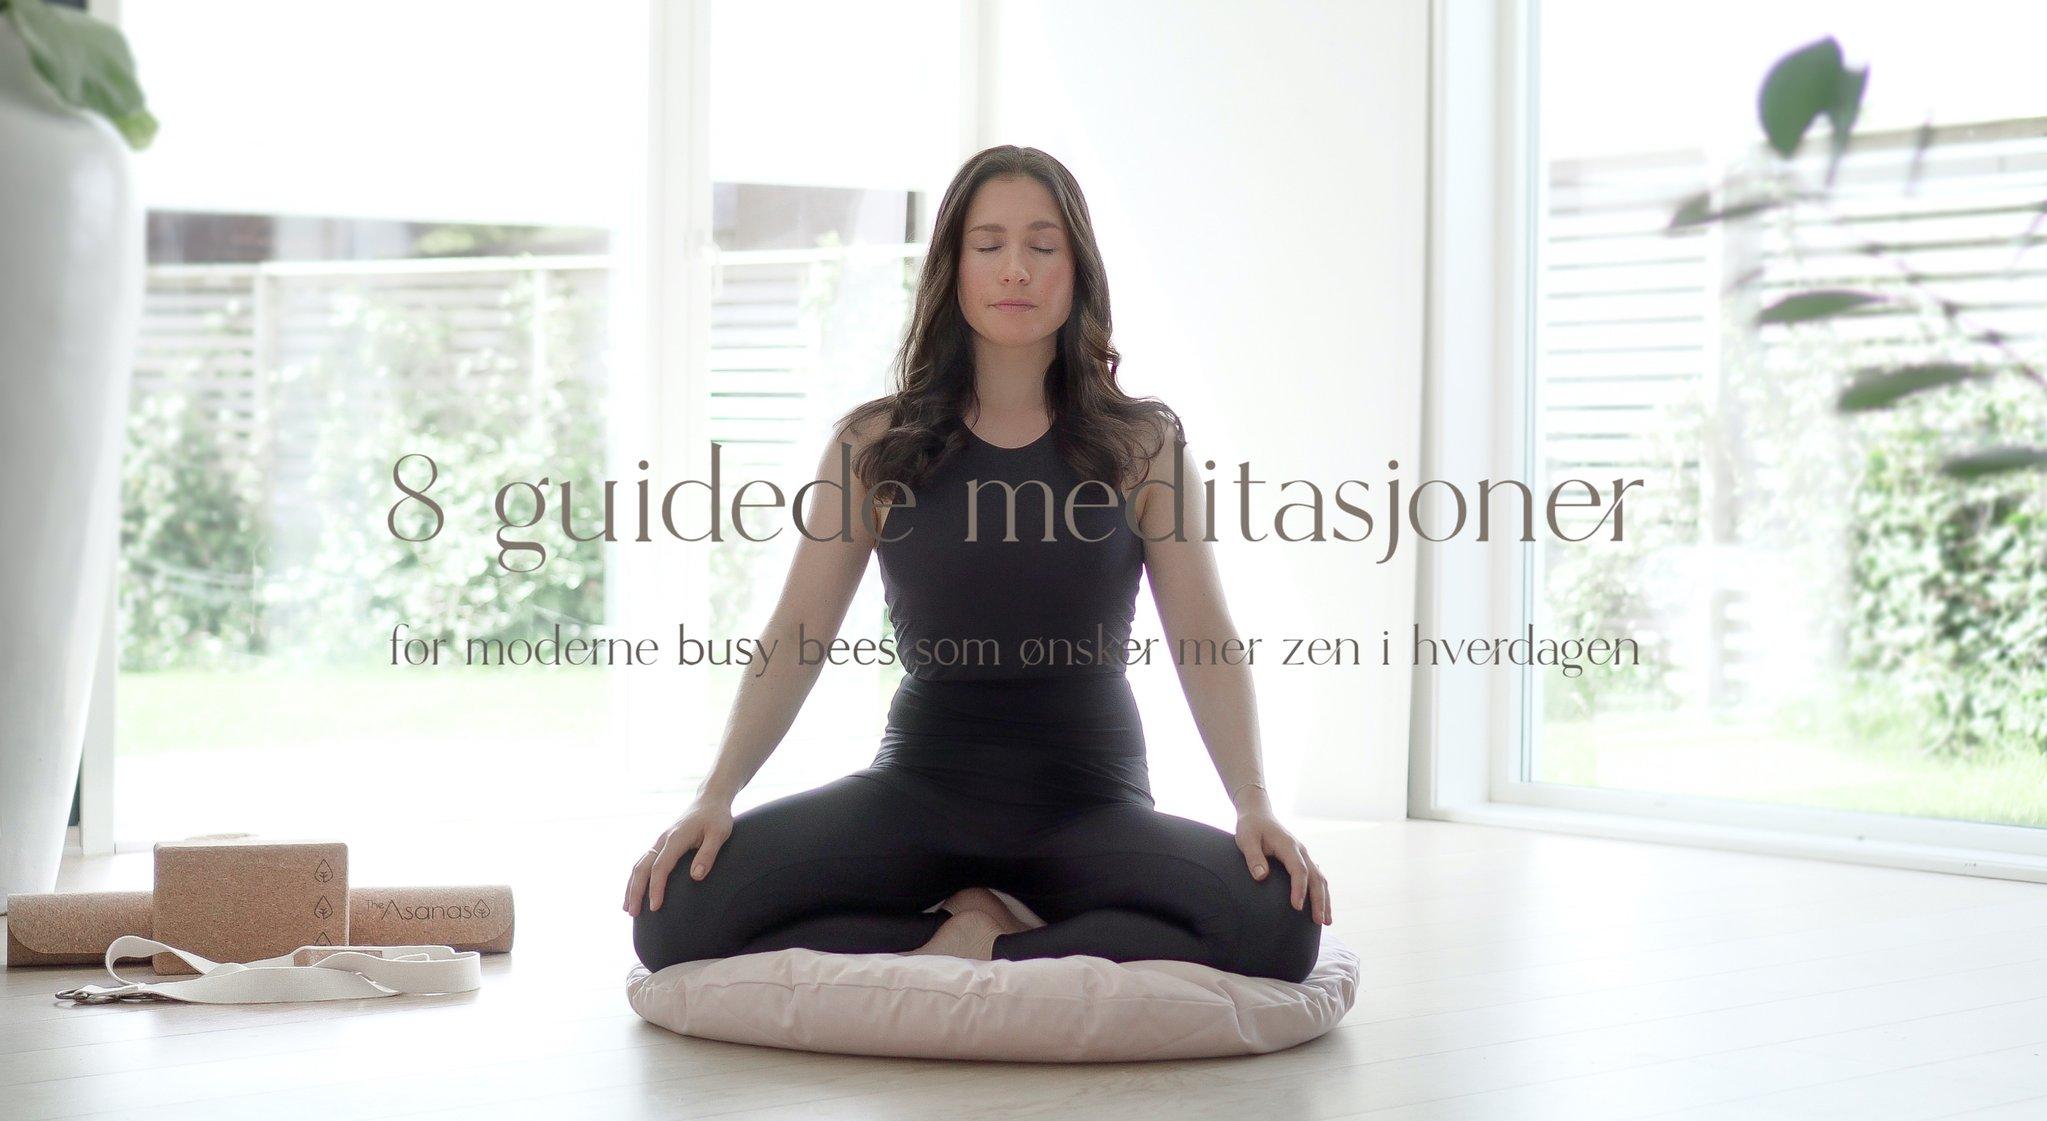 hvordan meditere med meditasjonskurs online på norsk med guidet mindfulness